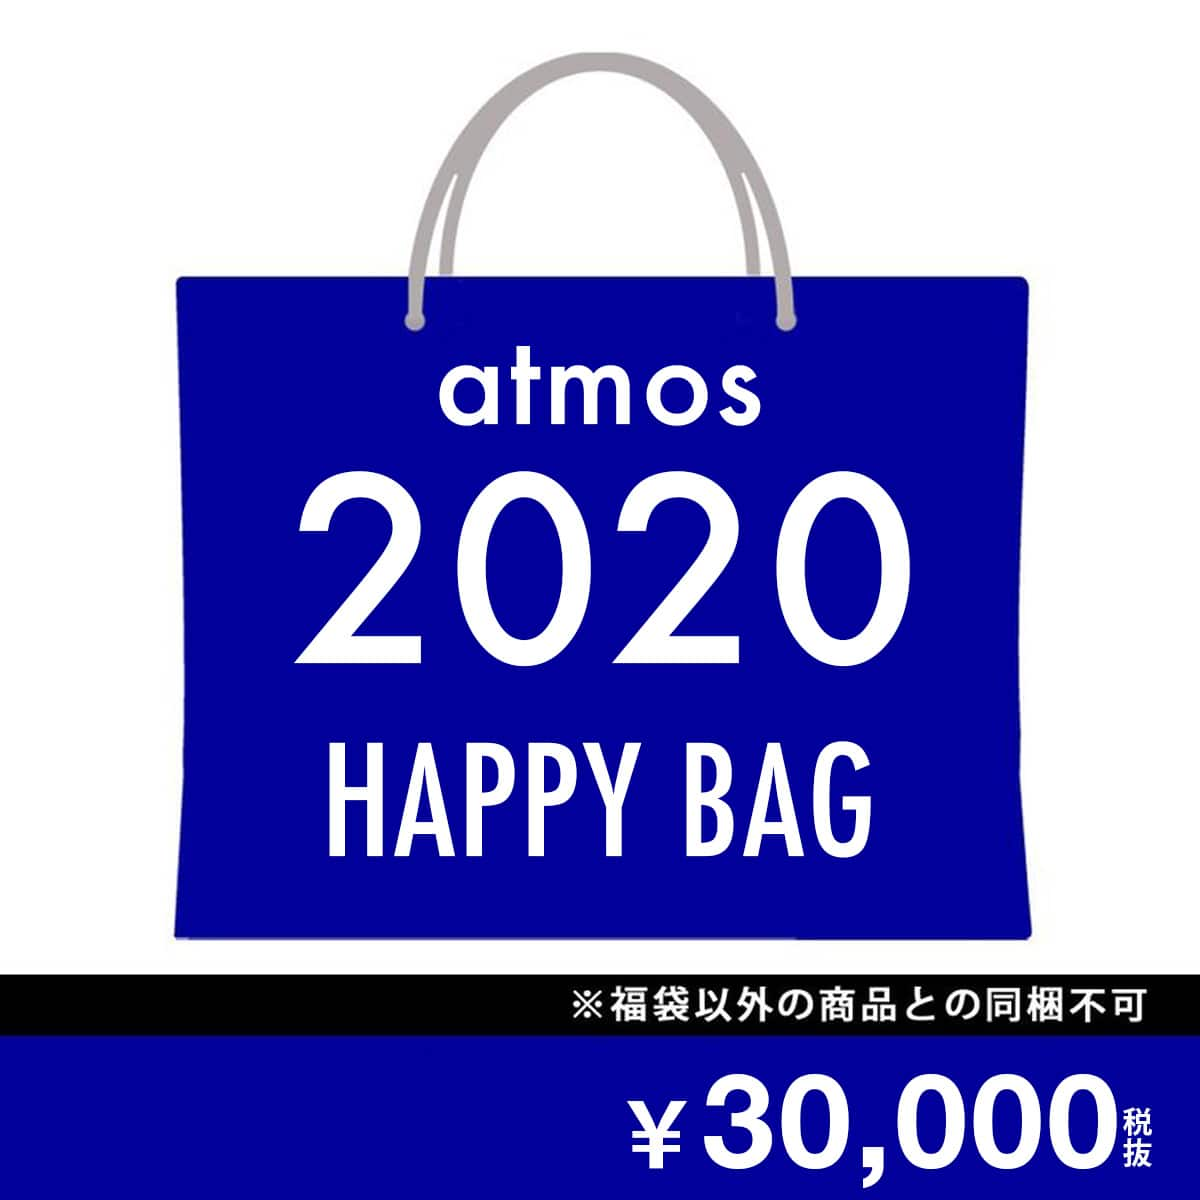 atmos 【2020年福袋】 HAPPY BAG 三万円 (MENS) 20SP-S_photo_large